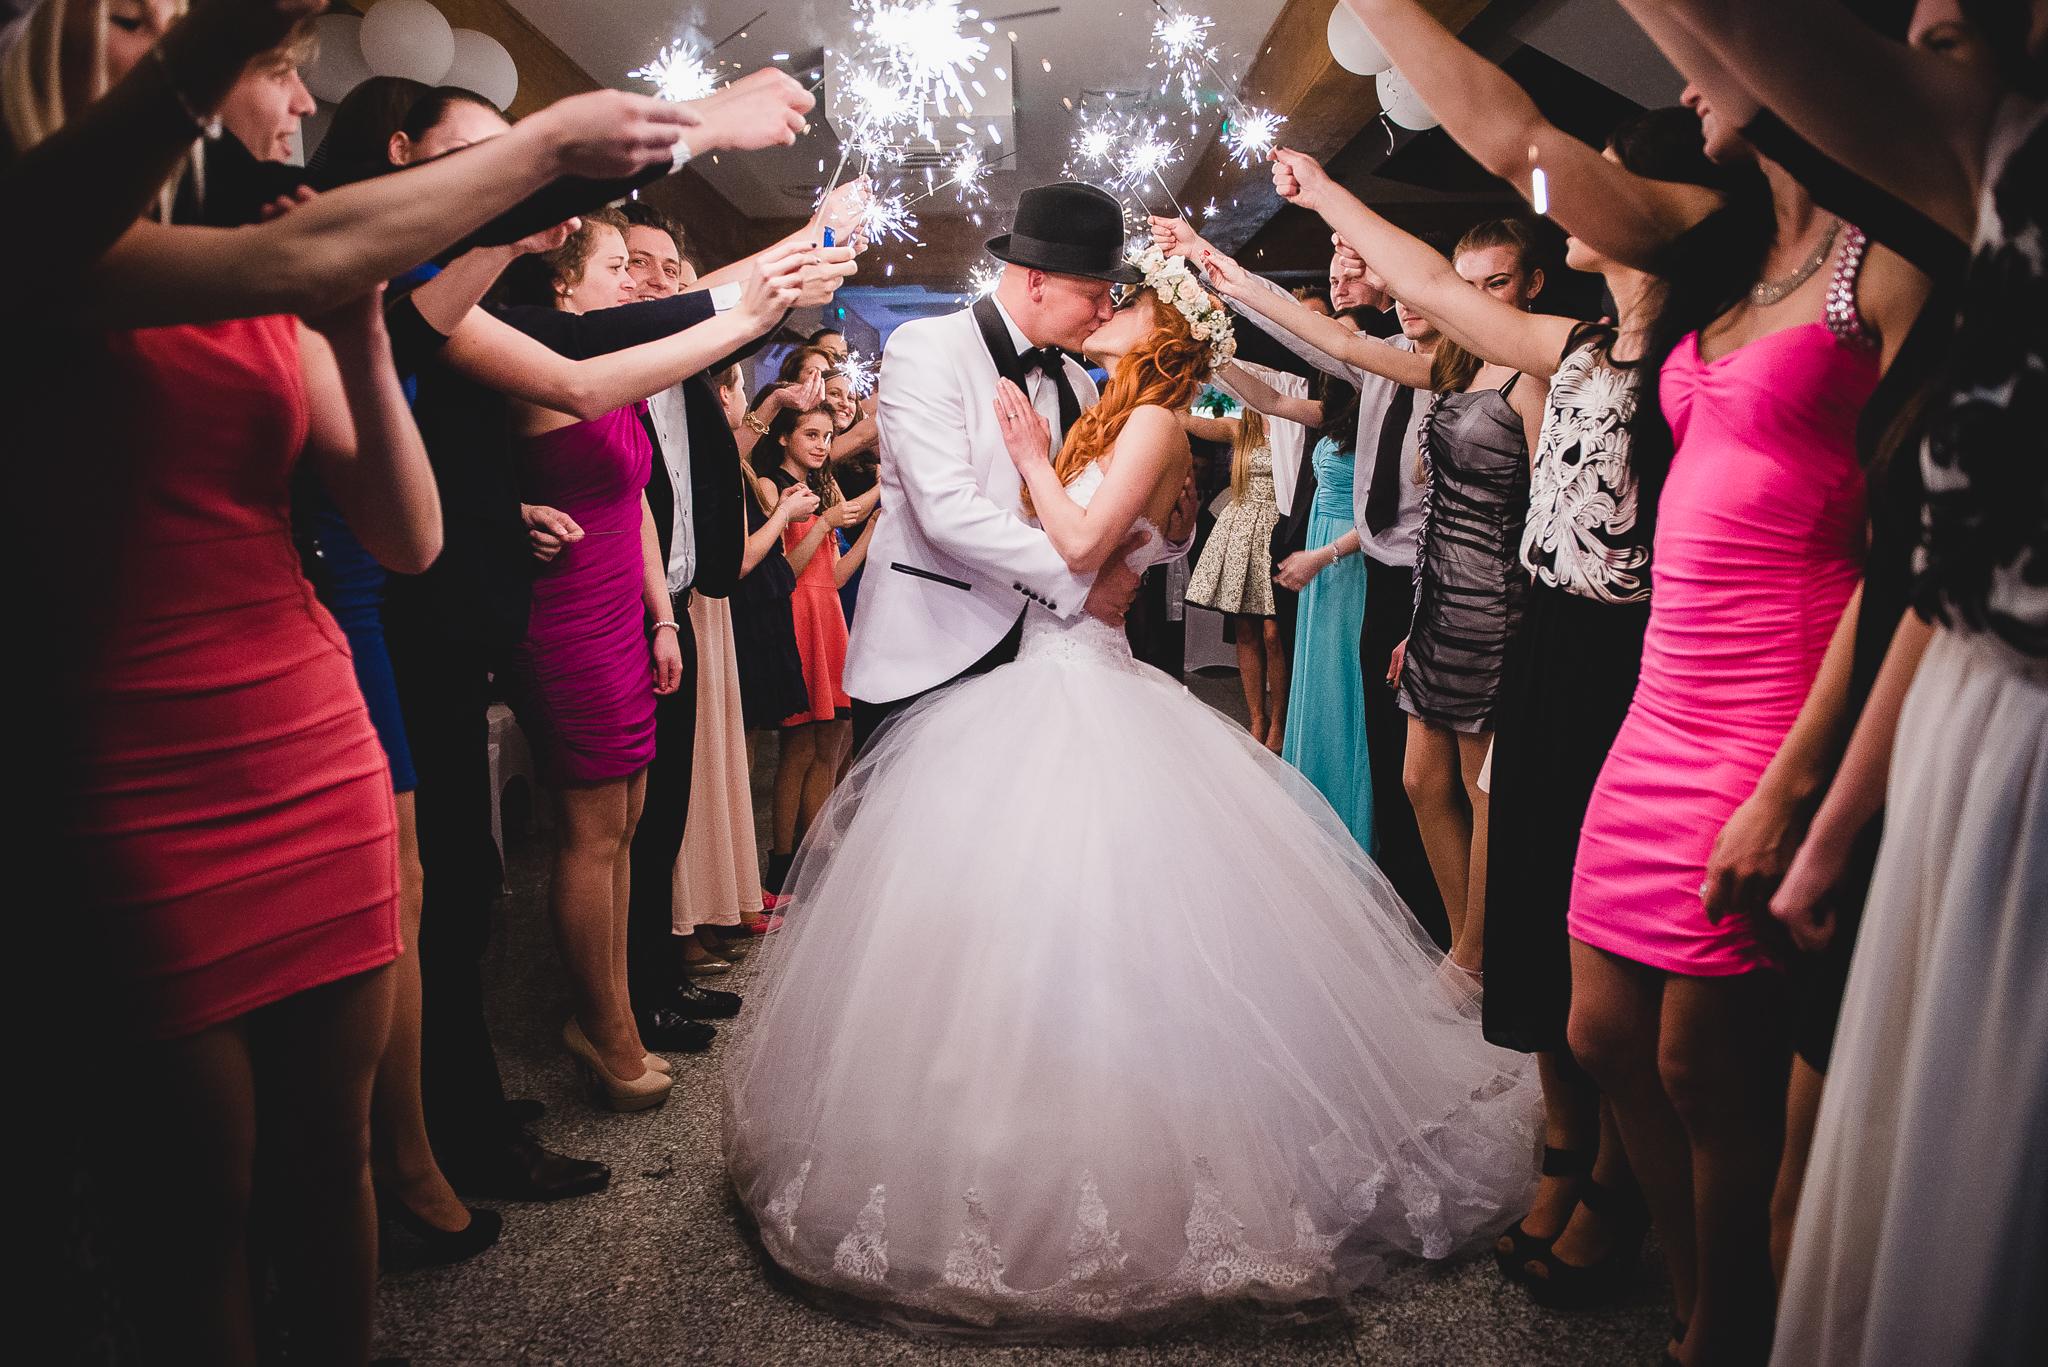 ženích, nevesta, šaty, prskavky, svetielka, romantika, svadobní hostia, tma, noc, bozk